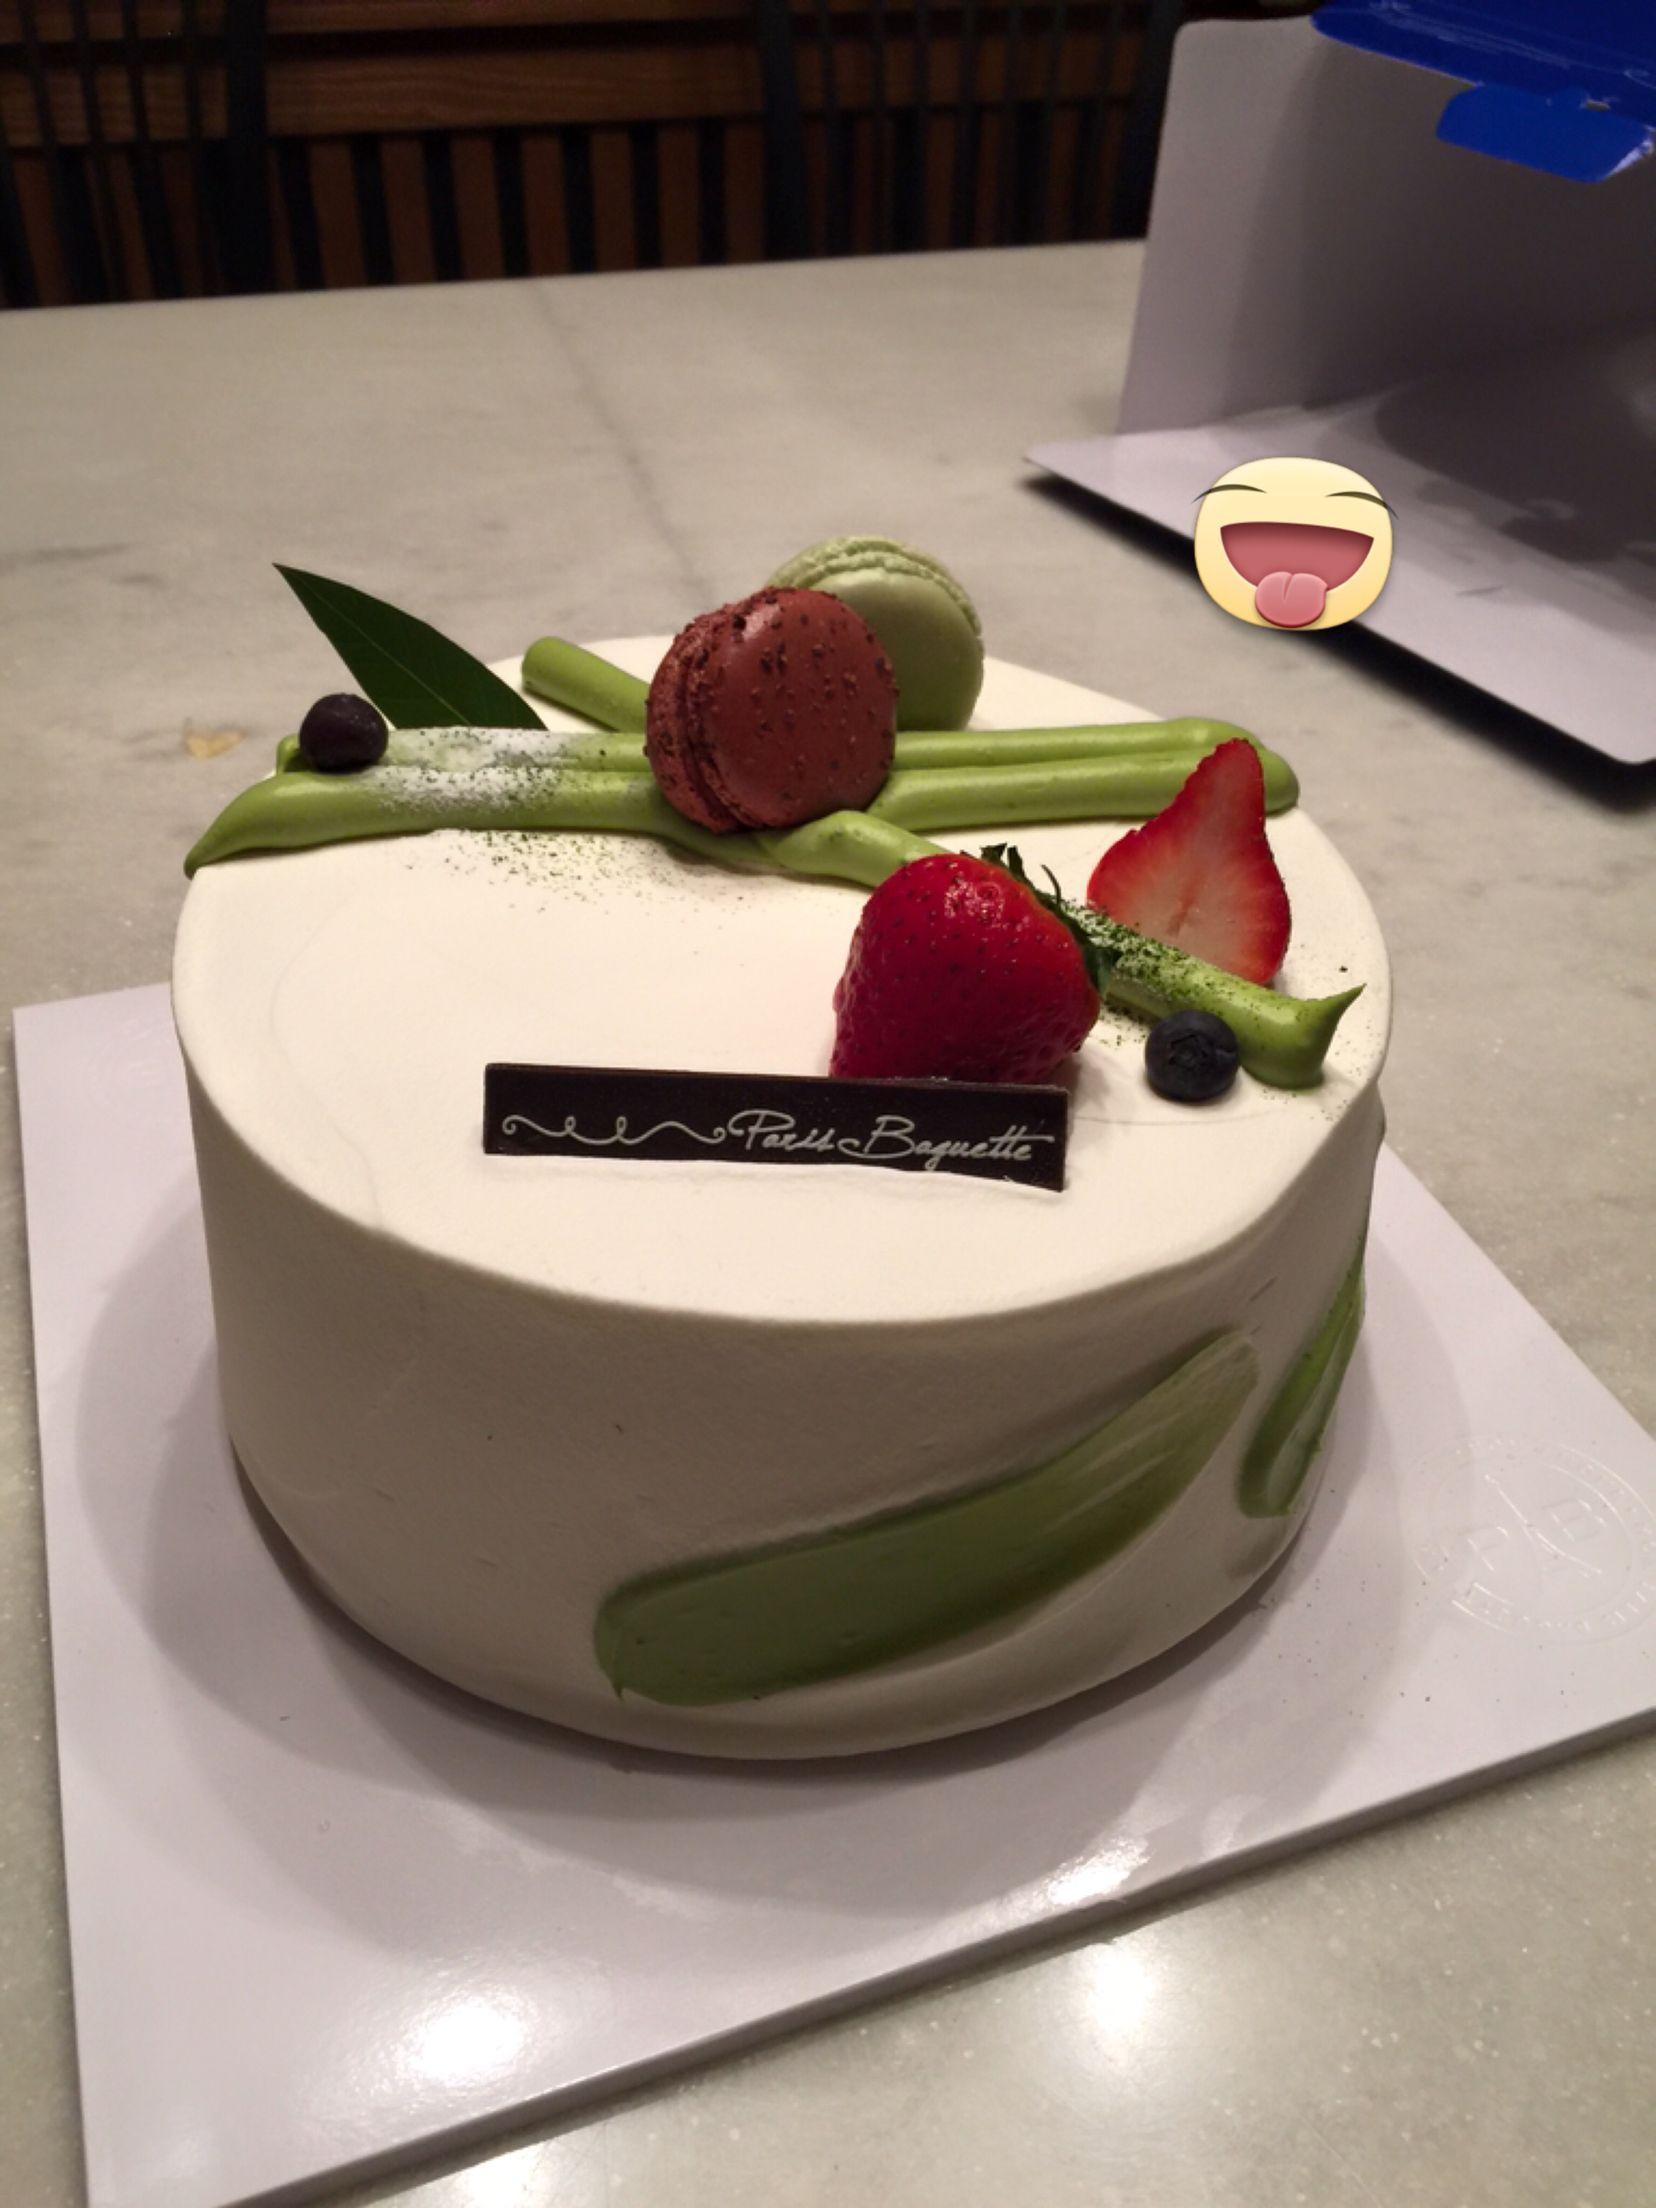 Beautiful cake from paris baguette cake birhday cake